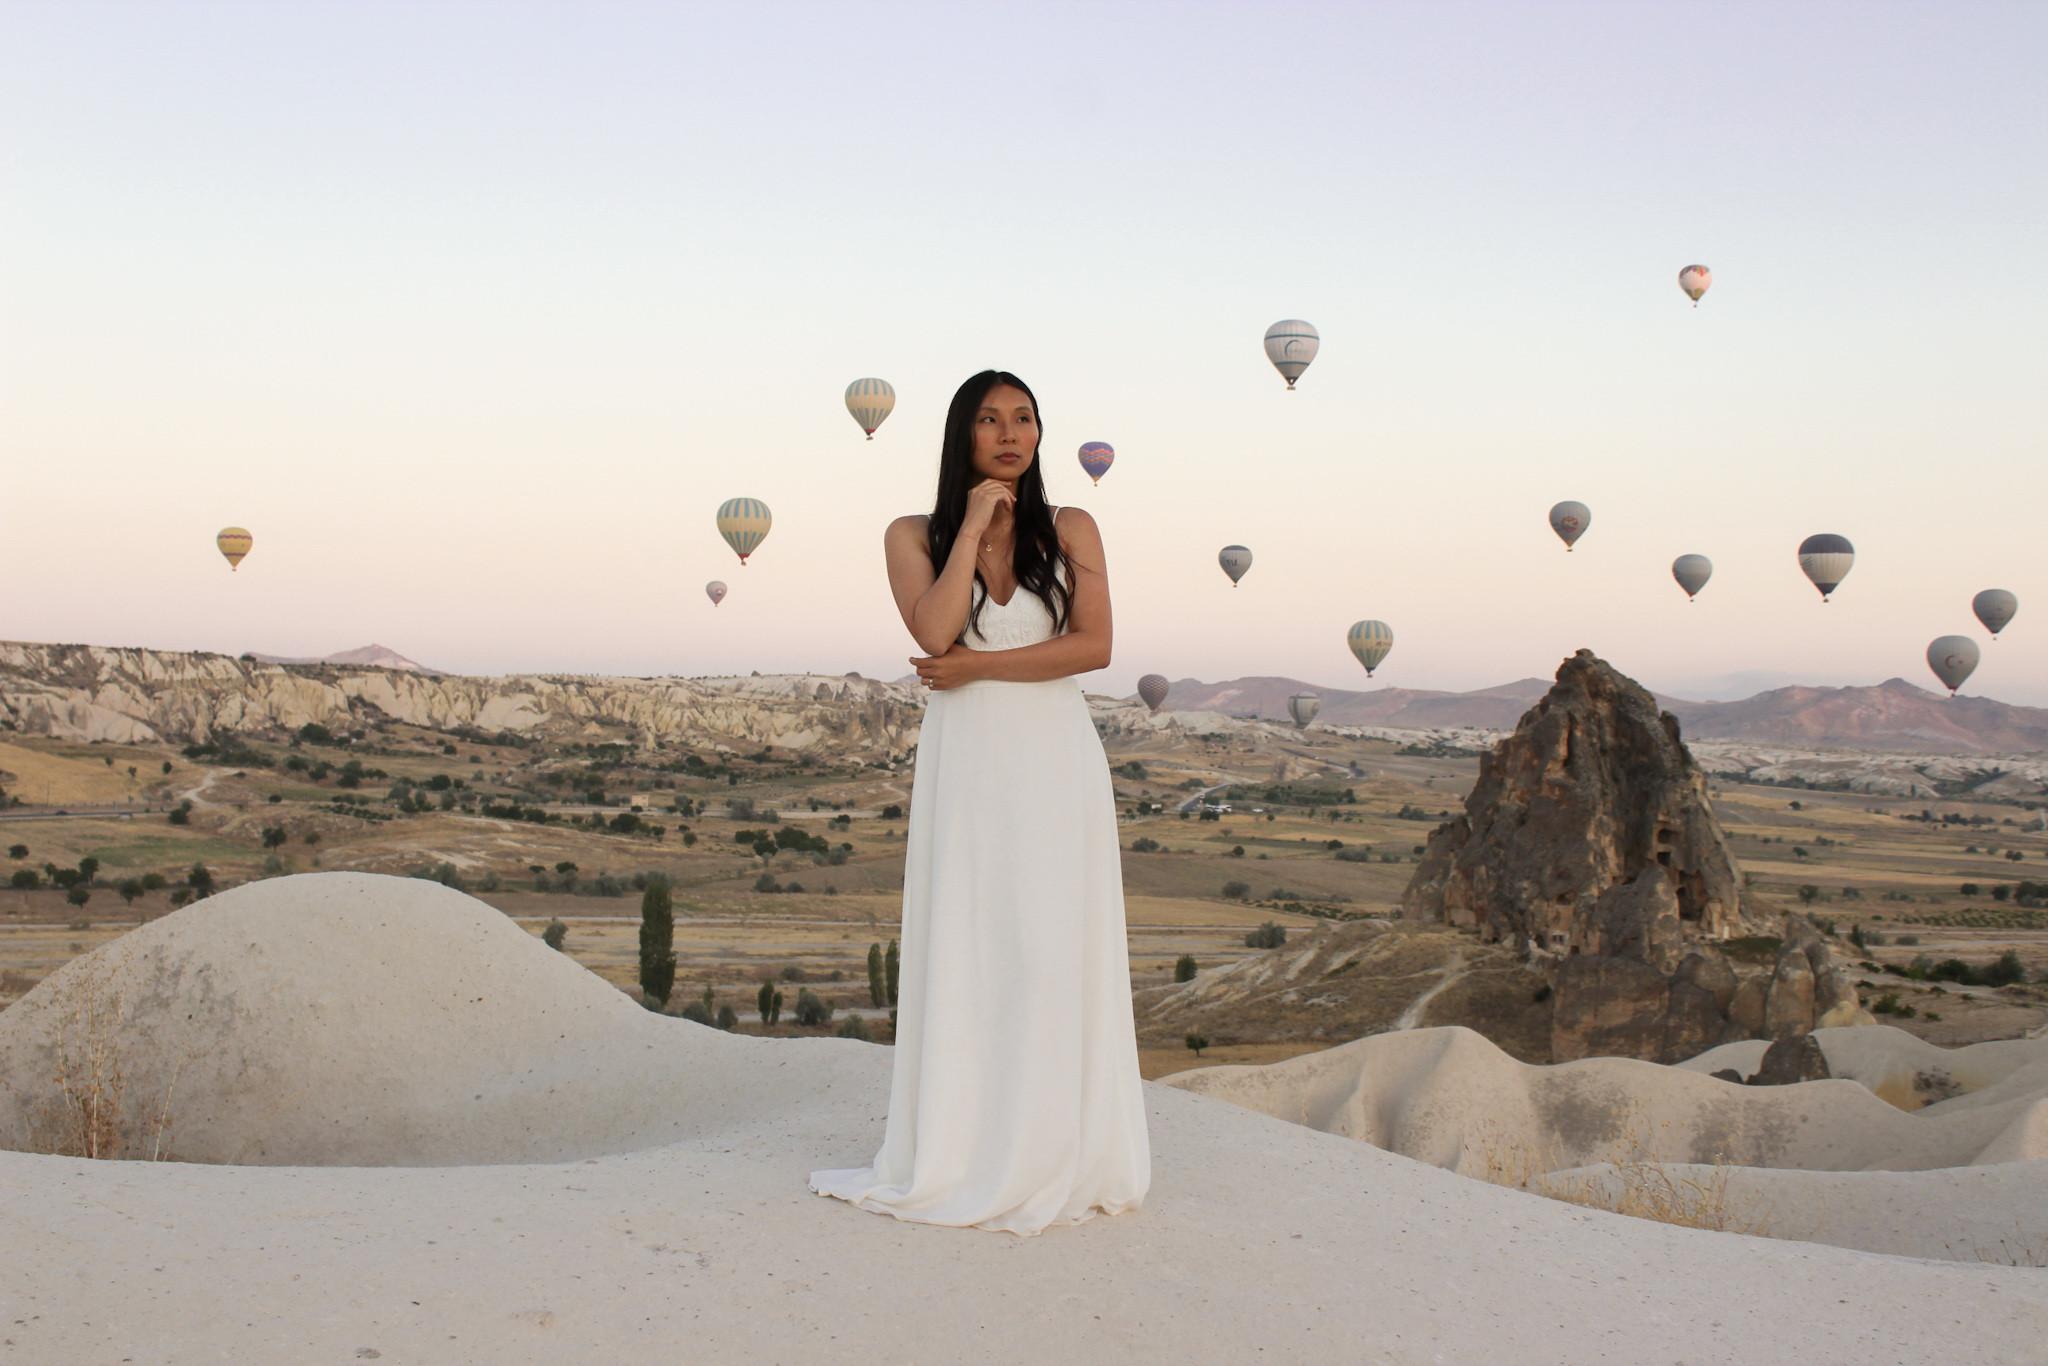 hot air balloon wedding in Cappadocia - beautiful elopement photography - Turkish elopement photoshoot -